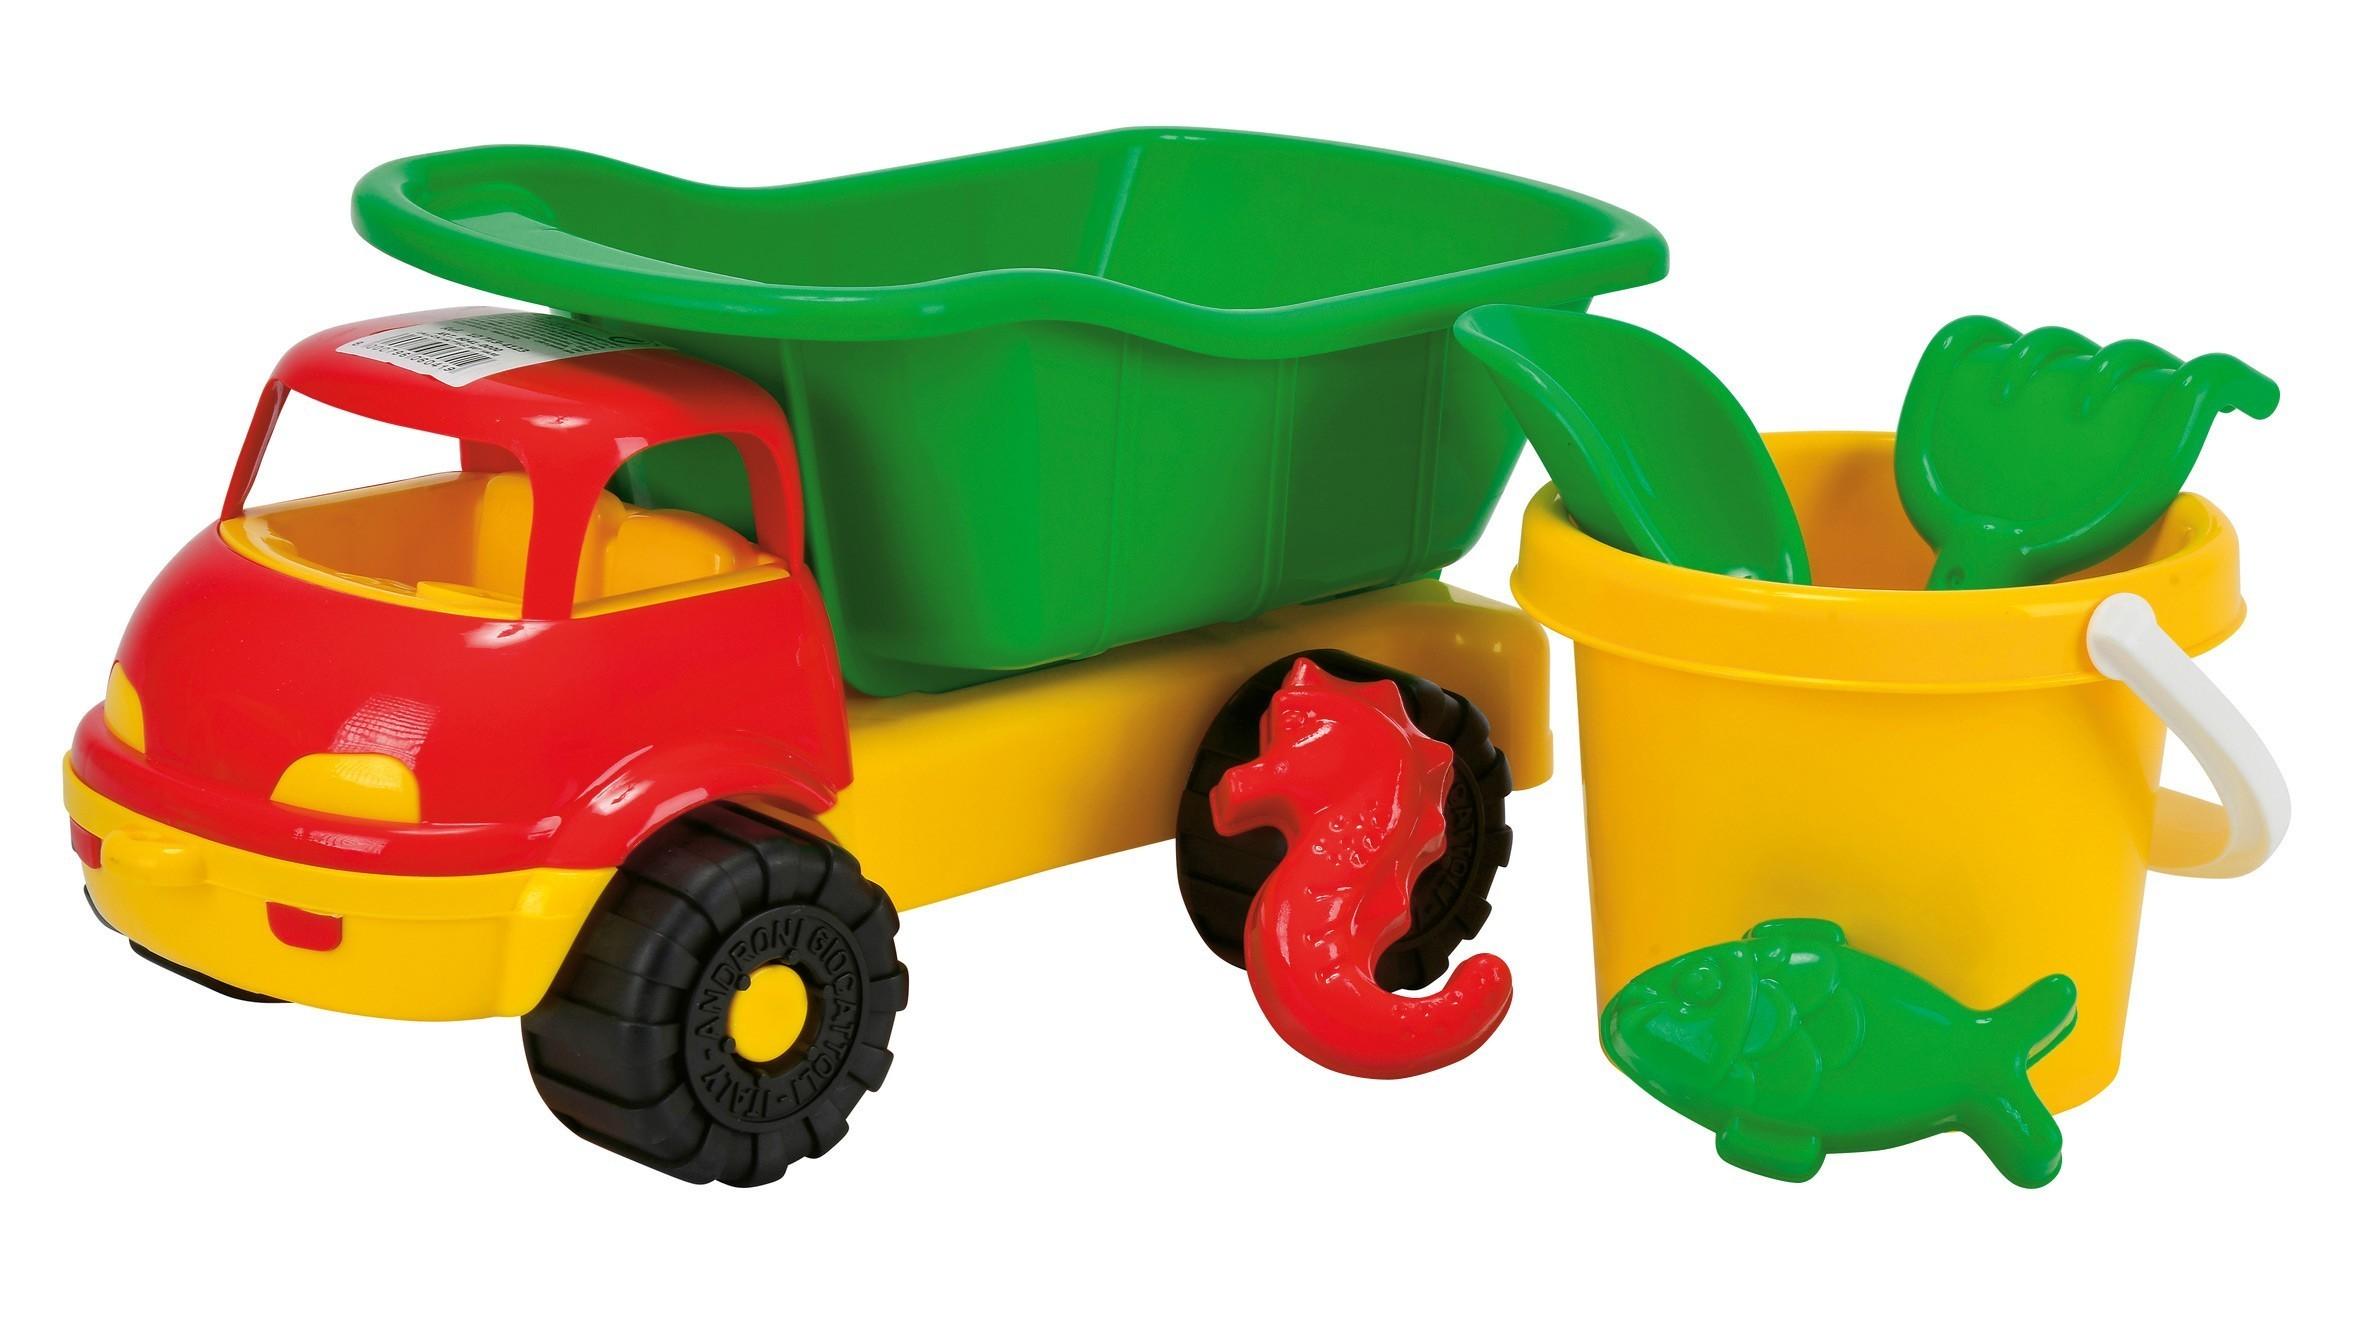 Sandspielzeug LKW mit Eimergarnitur 6-teilig Simba Bild 2